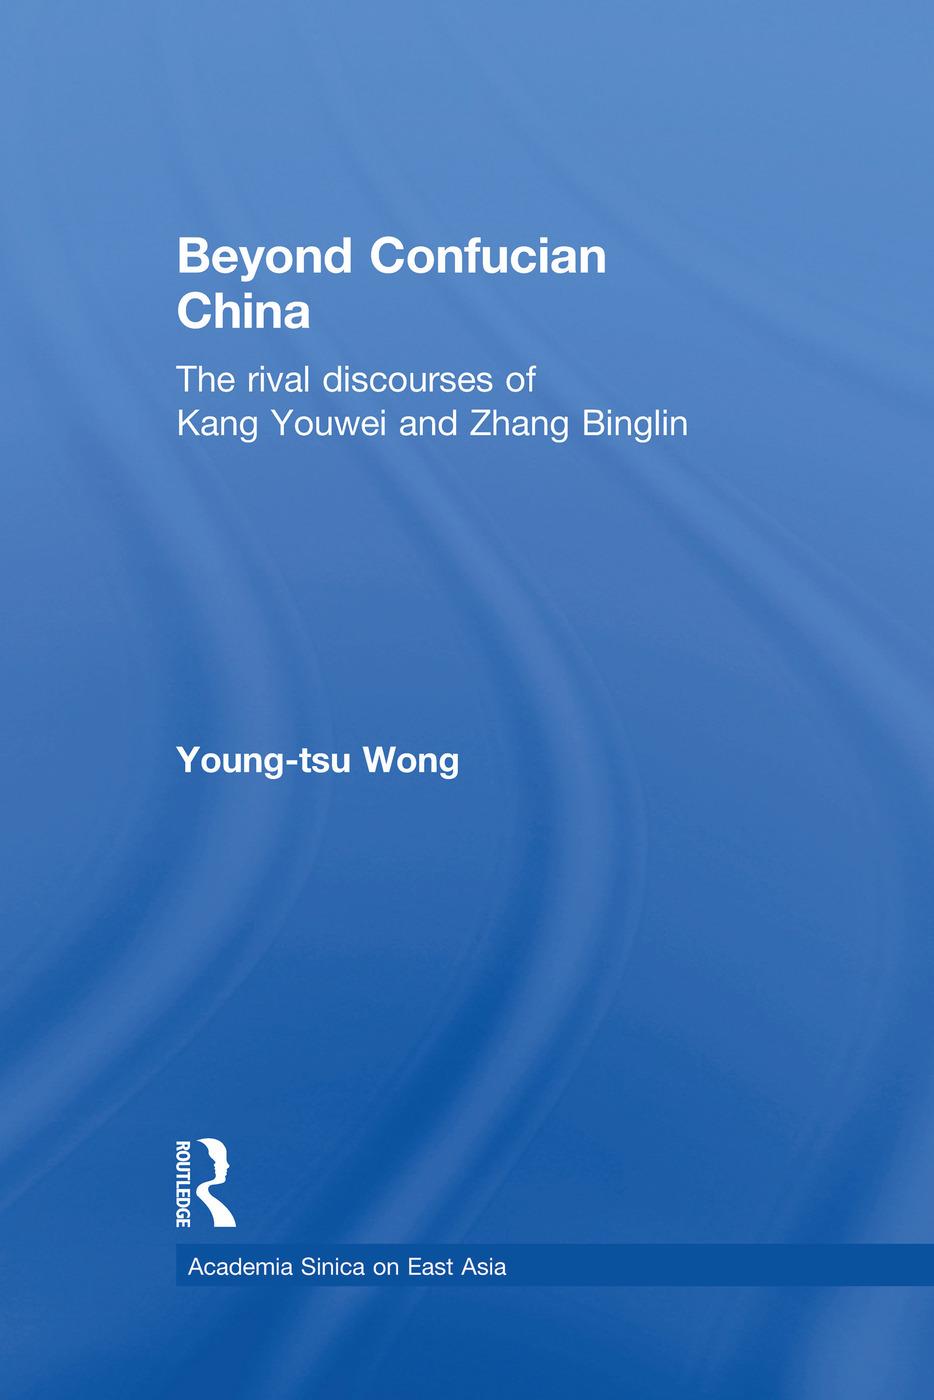 Beyond Confucian China: The Rival Discourses of Kang Youwei and Zhang Binglin book cover